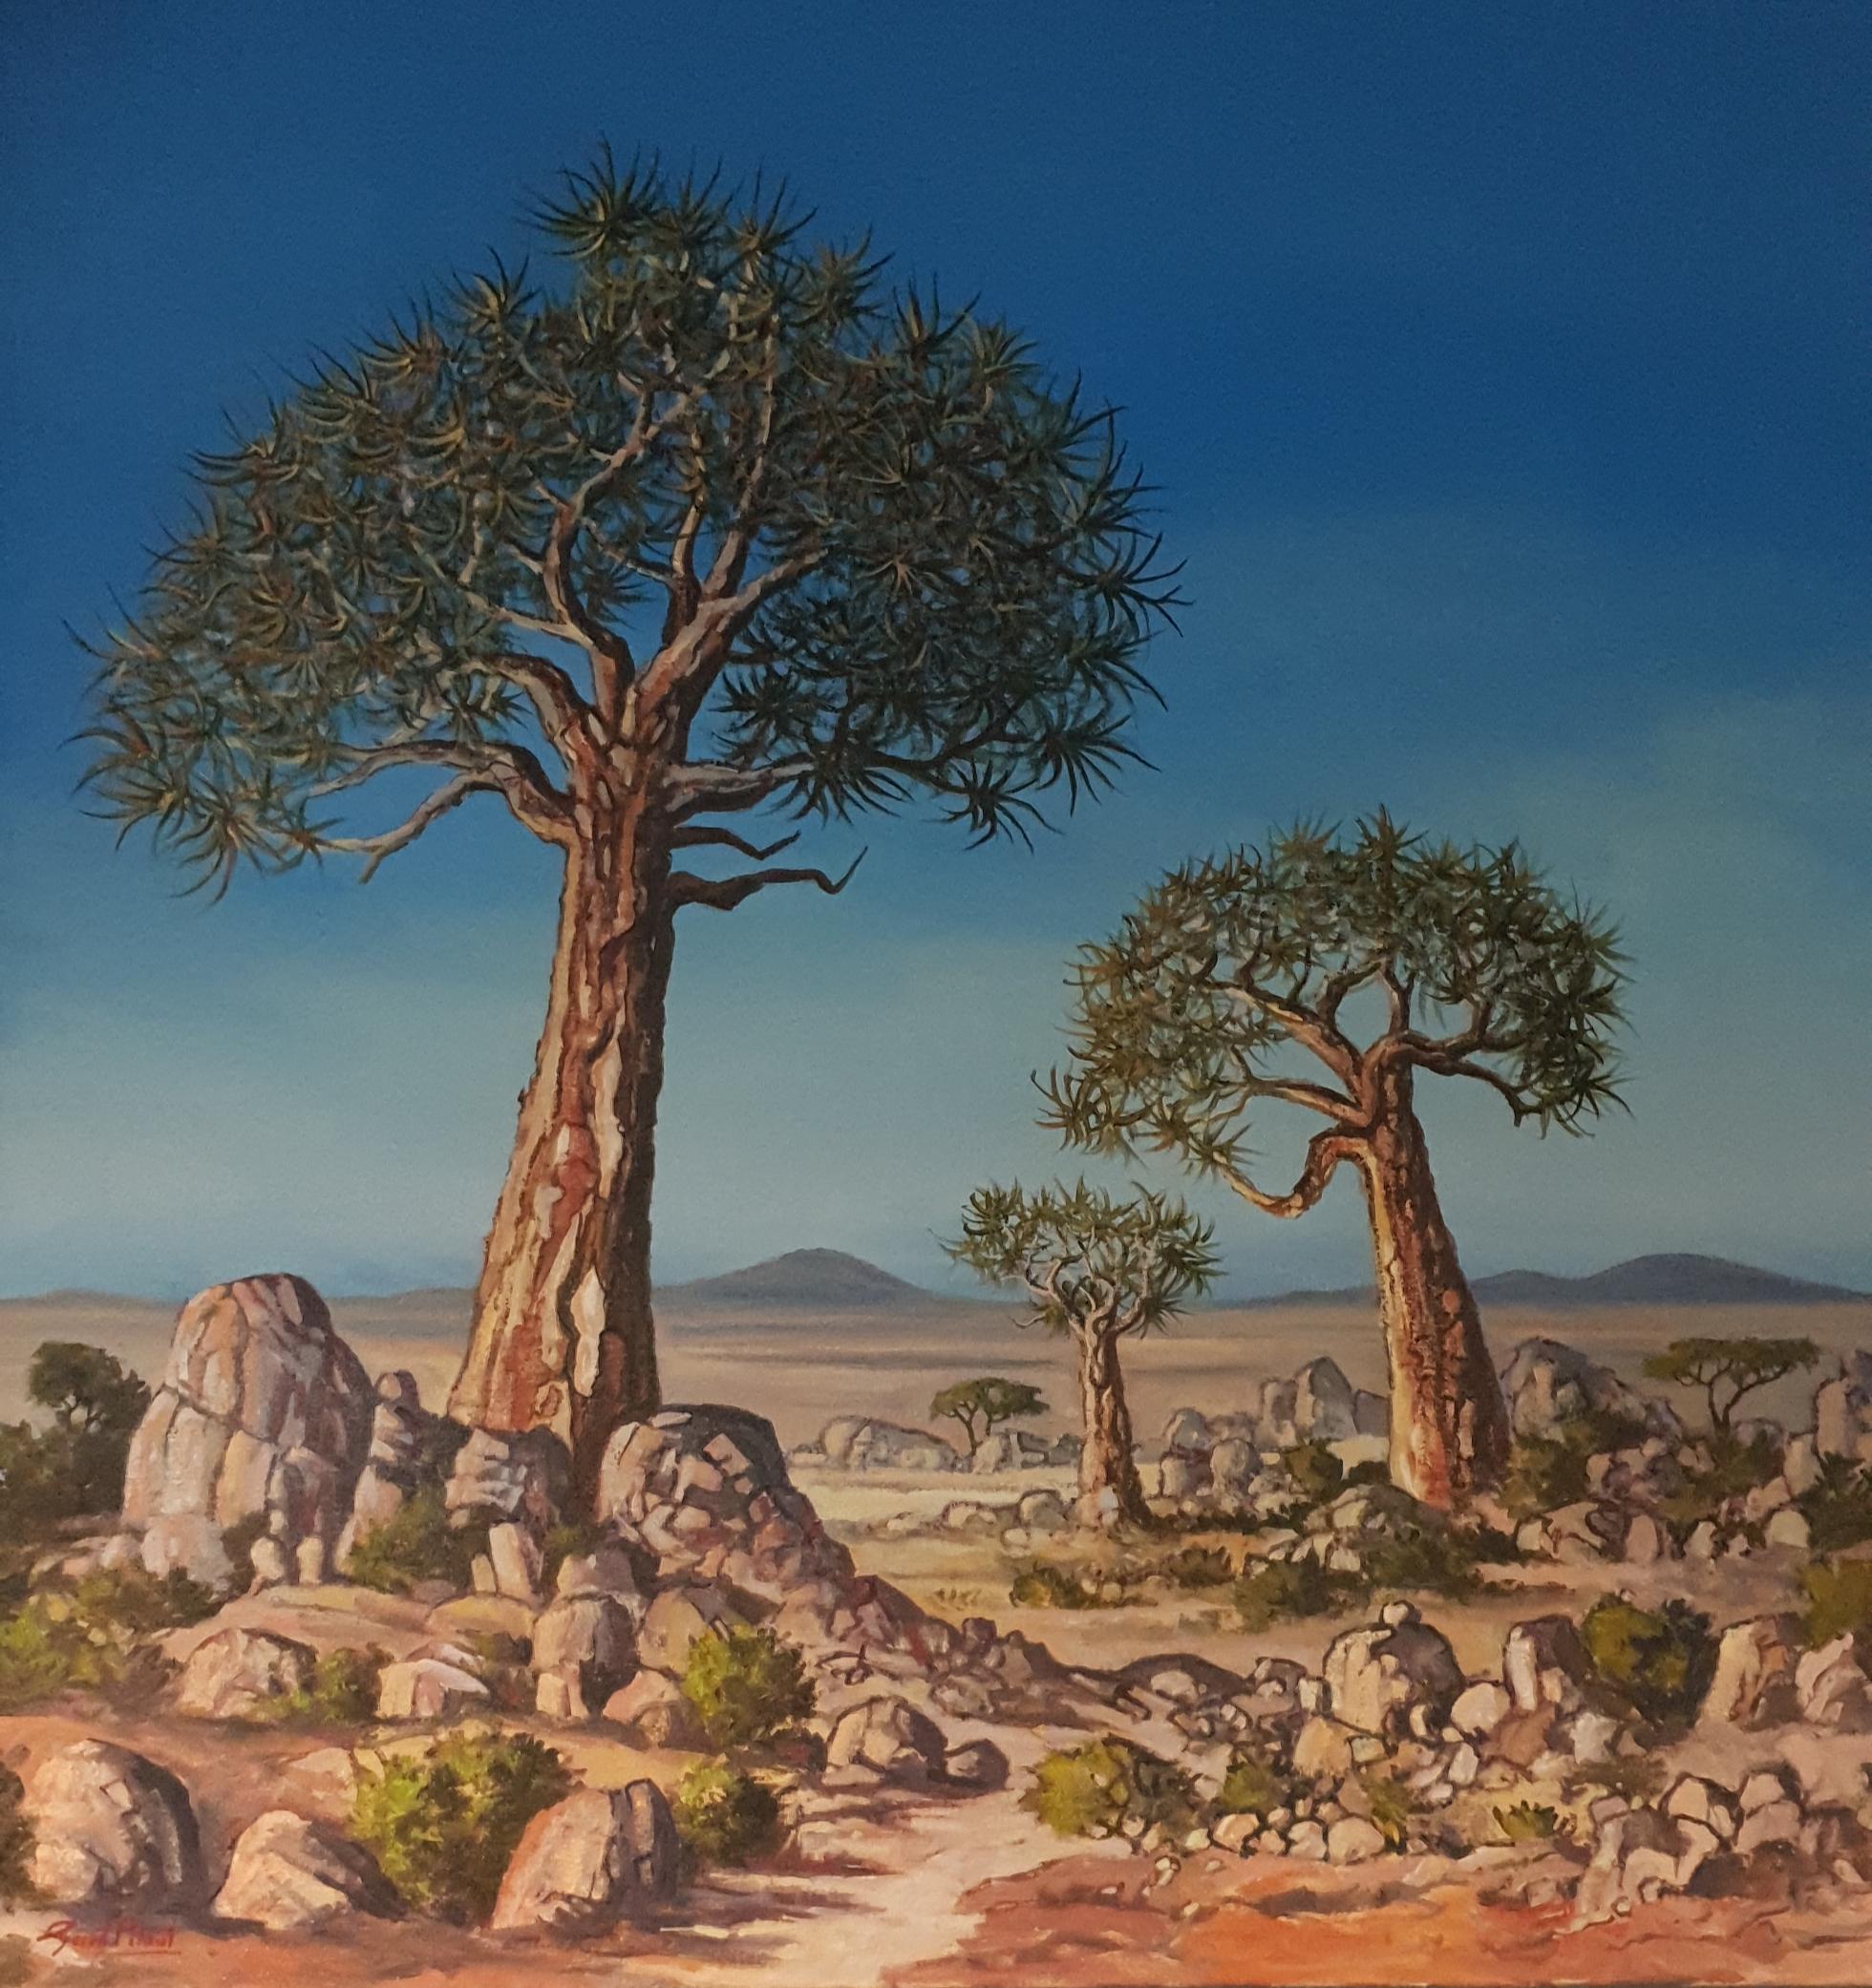 gerrit pitout Quiver trees